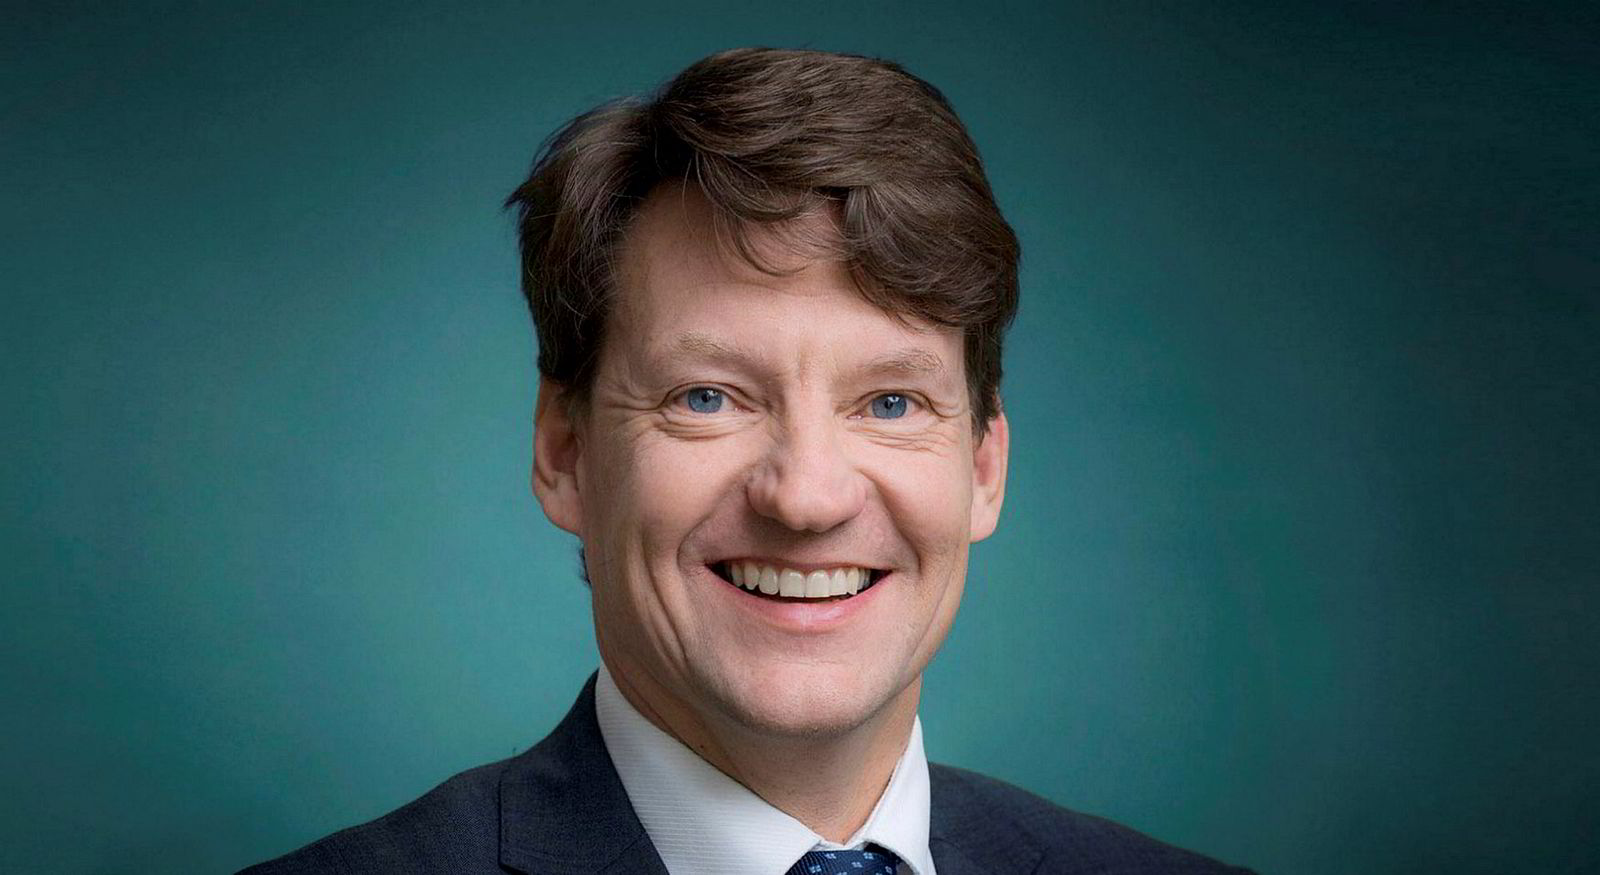 Ålesund-advokat Reidar Andresen ble styreleder i eiendomsmeglerkontoret 1. april i år. Han varsler at kontoret vil klage på Finanstilsynets avskilting.